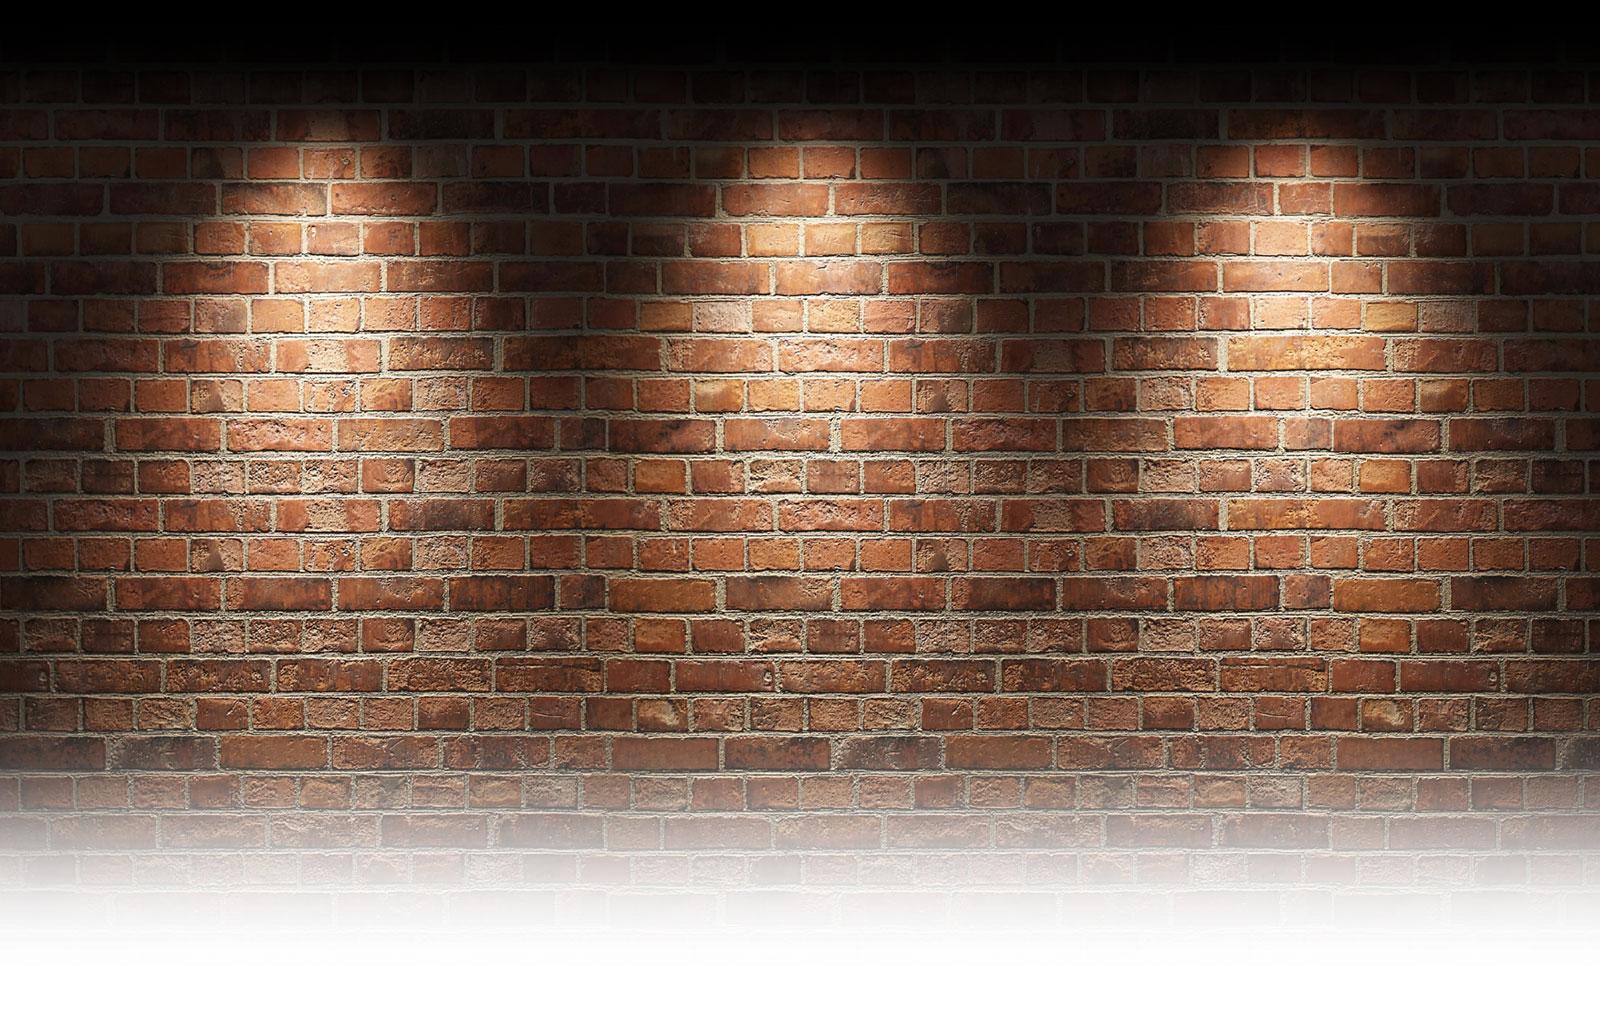 Brick Wall Lights